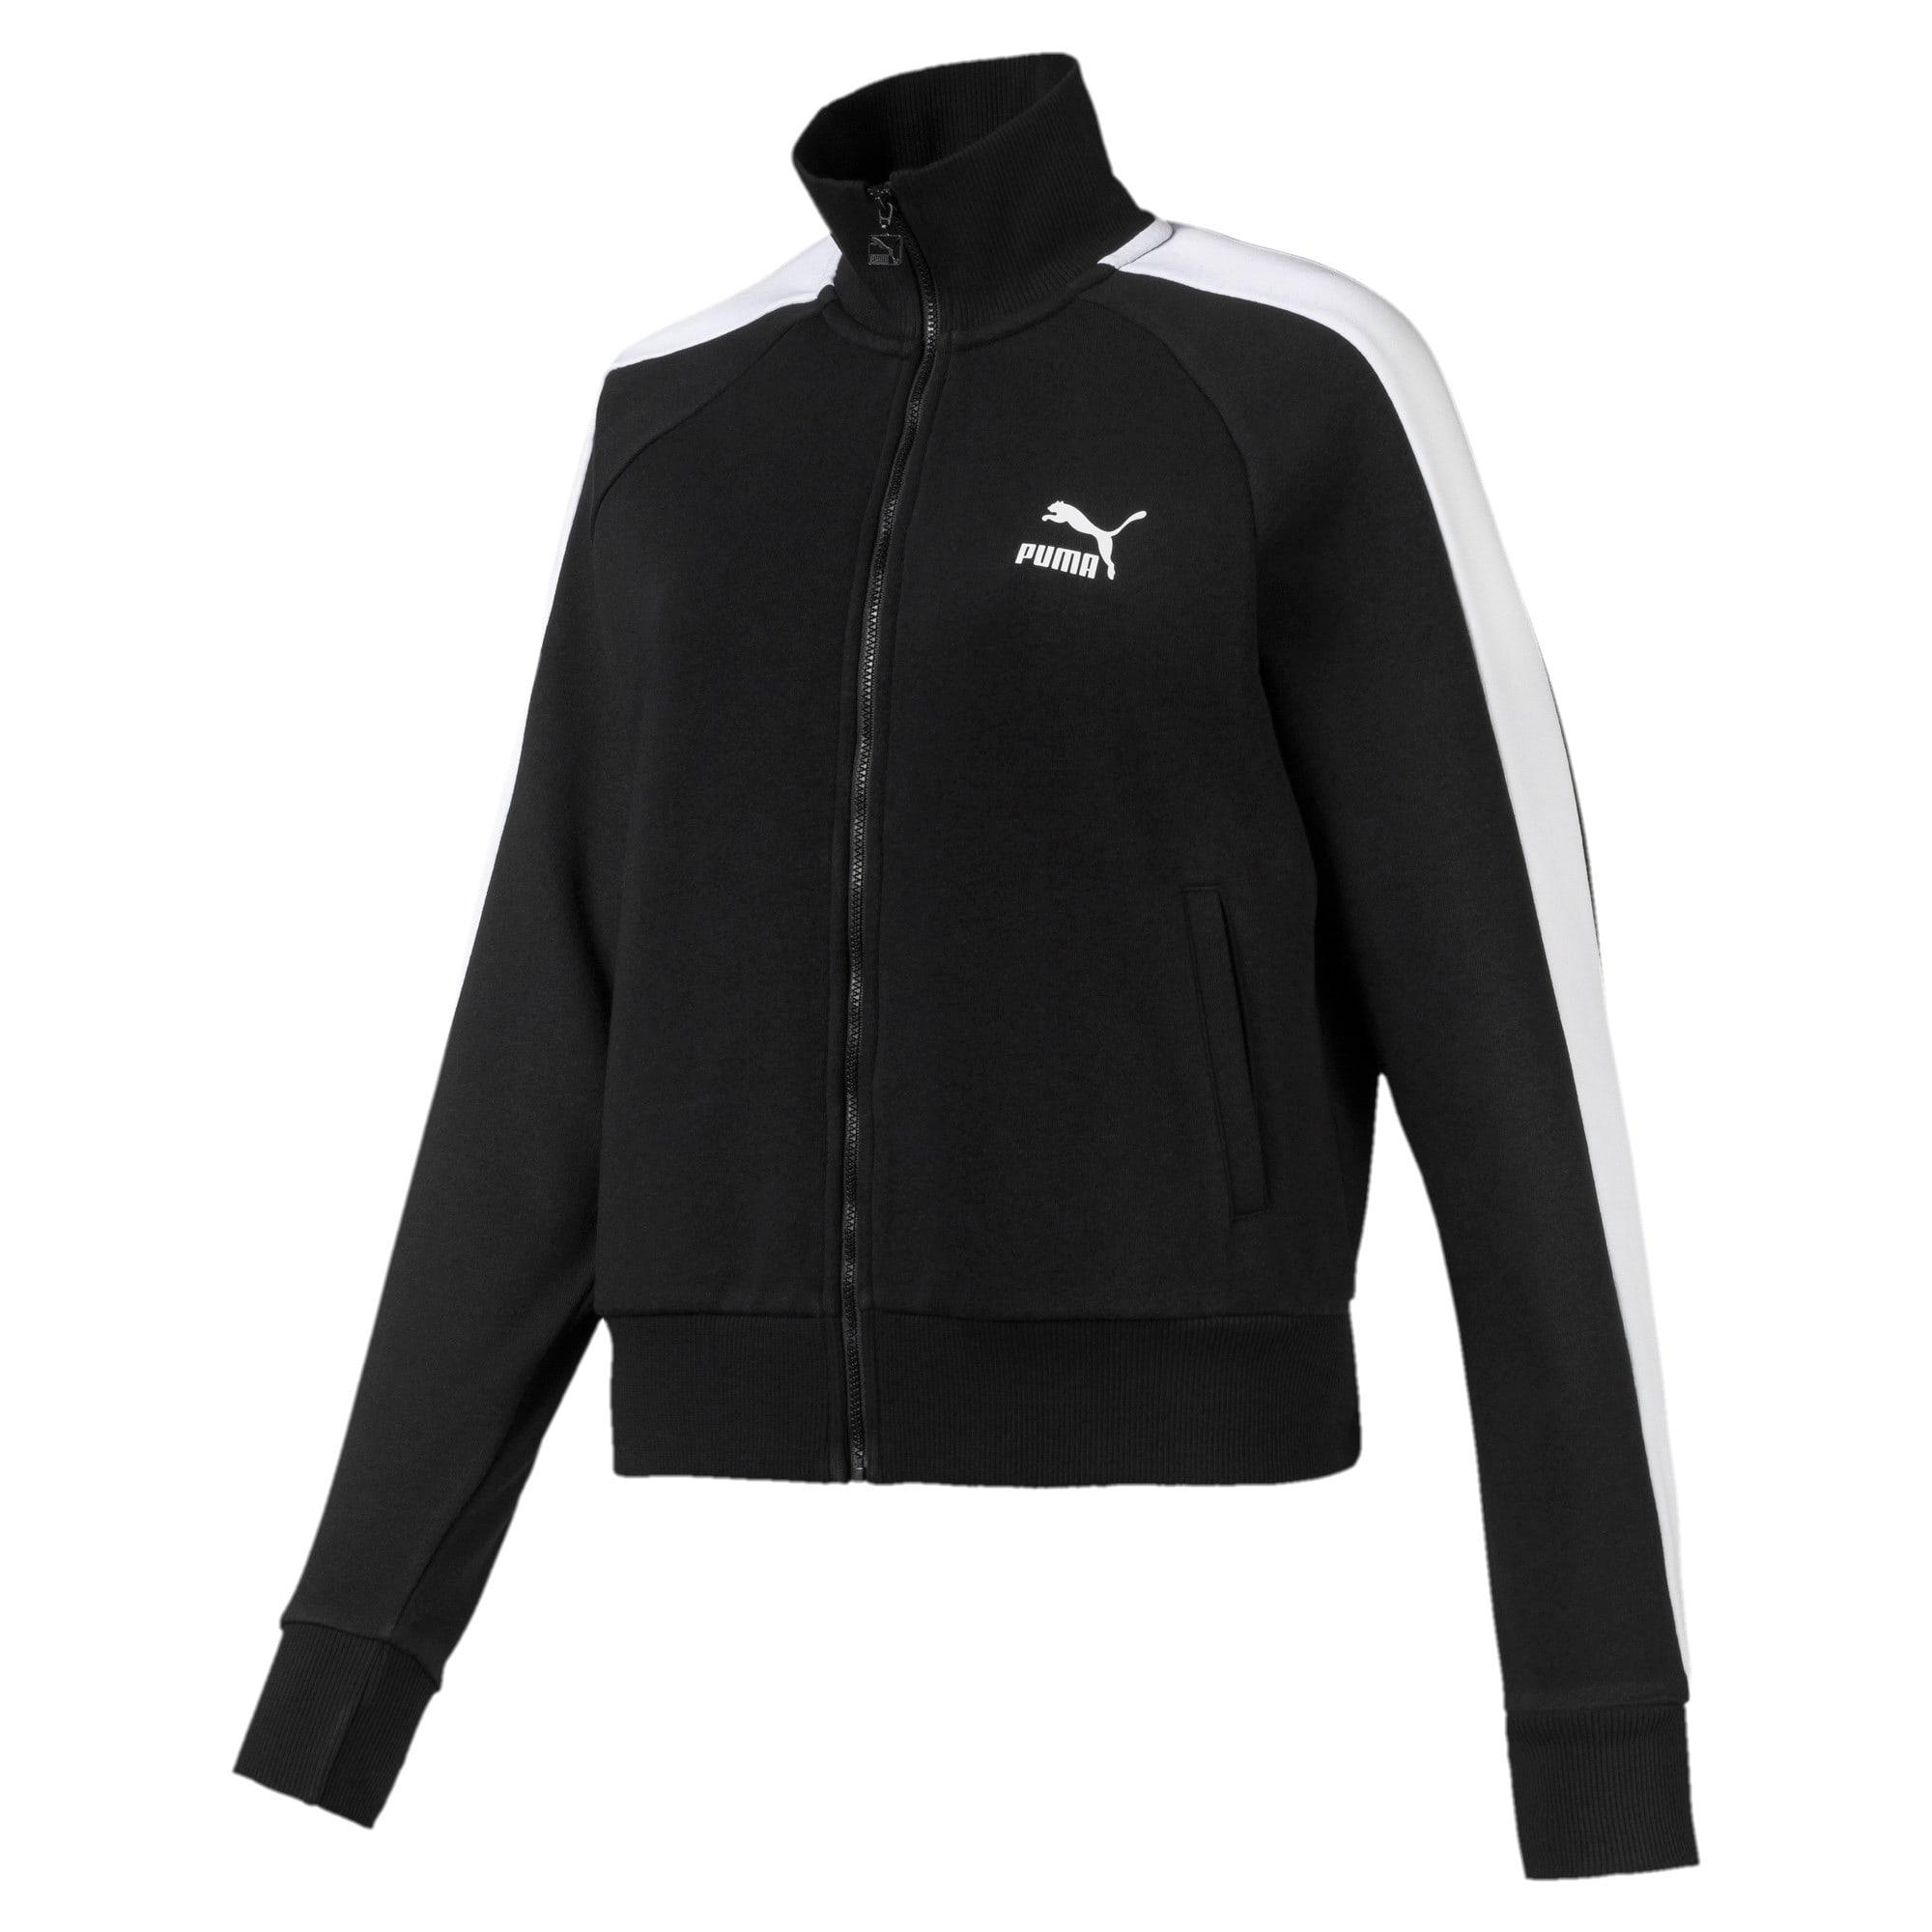 Miniatura 1 de Chaqueta deportiva Classics T7 para mujer, Puma Black, mediano